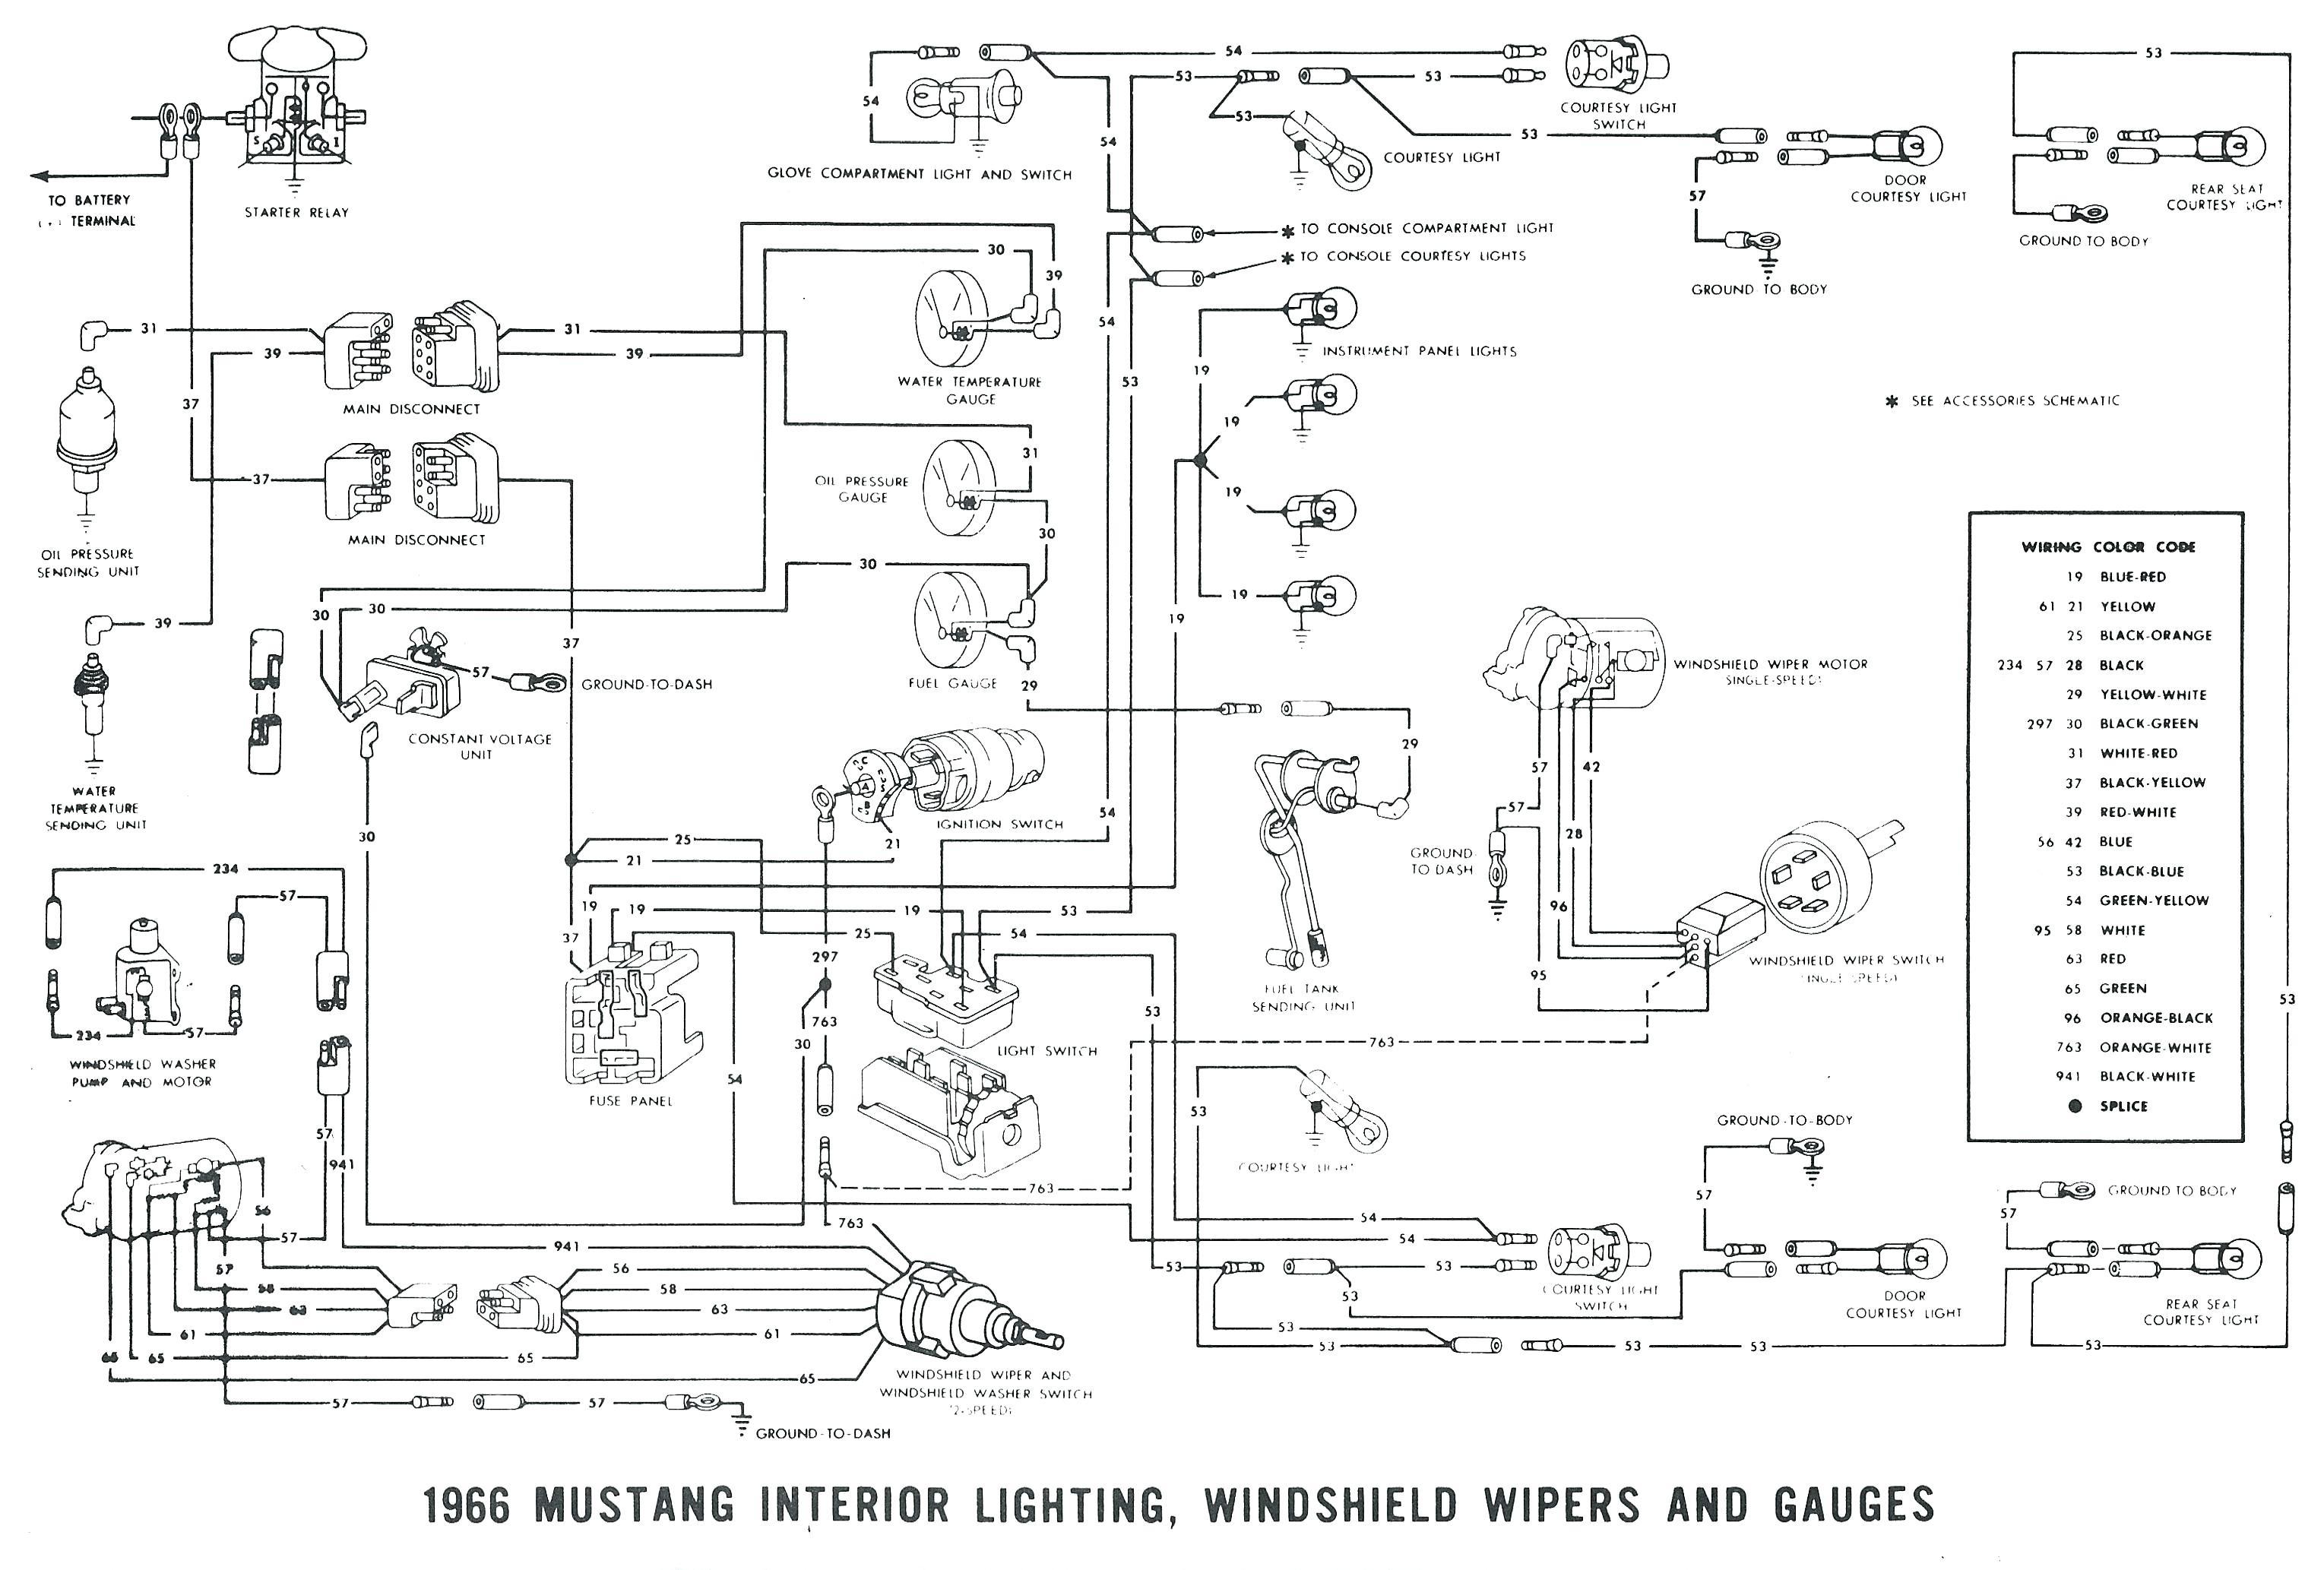 1990 Mustang Wiring Diagram 1990 ford Mustang Alternator Wiring Diagram Engine Diagrams 90 Radio Of 1990 Mustang Wiring Diagram